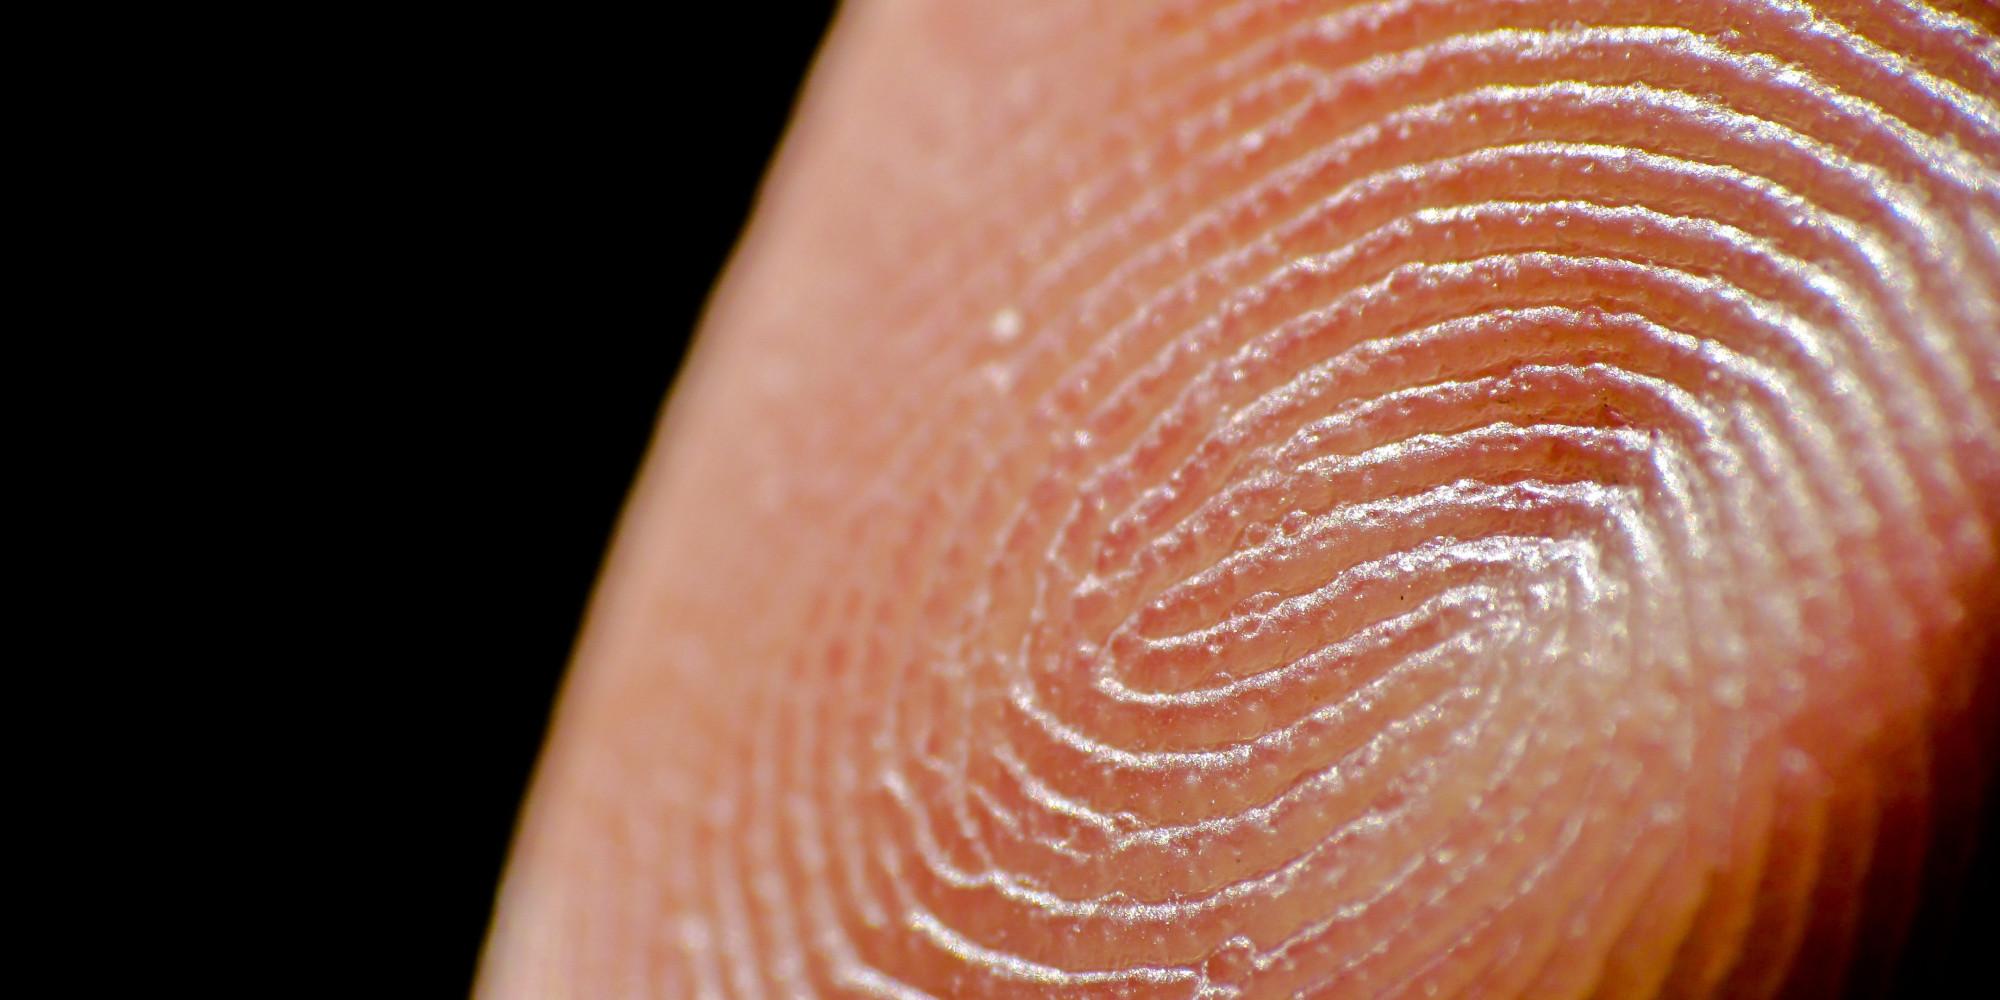 how to get good fingerprints